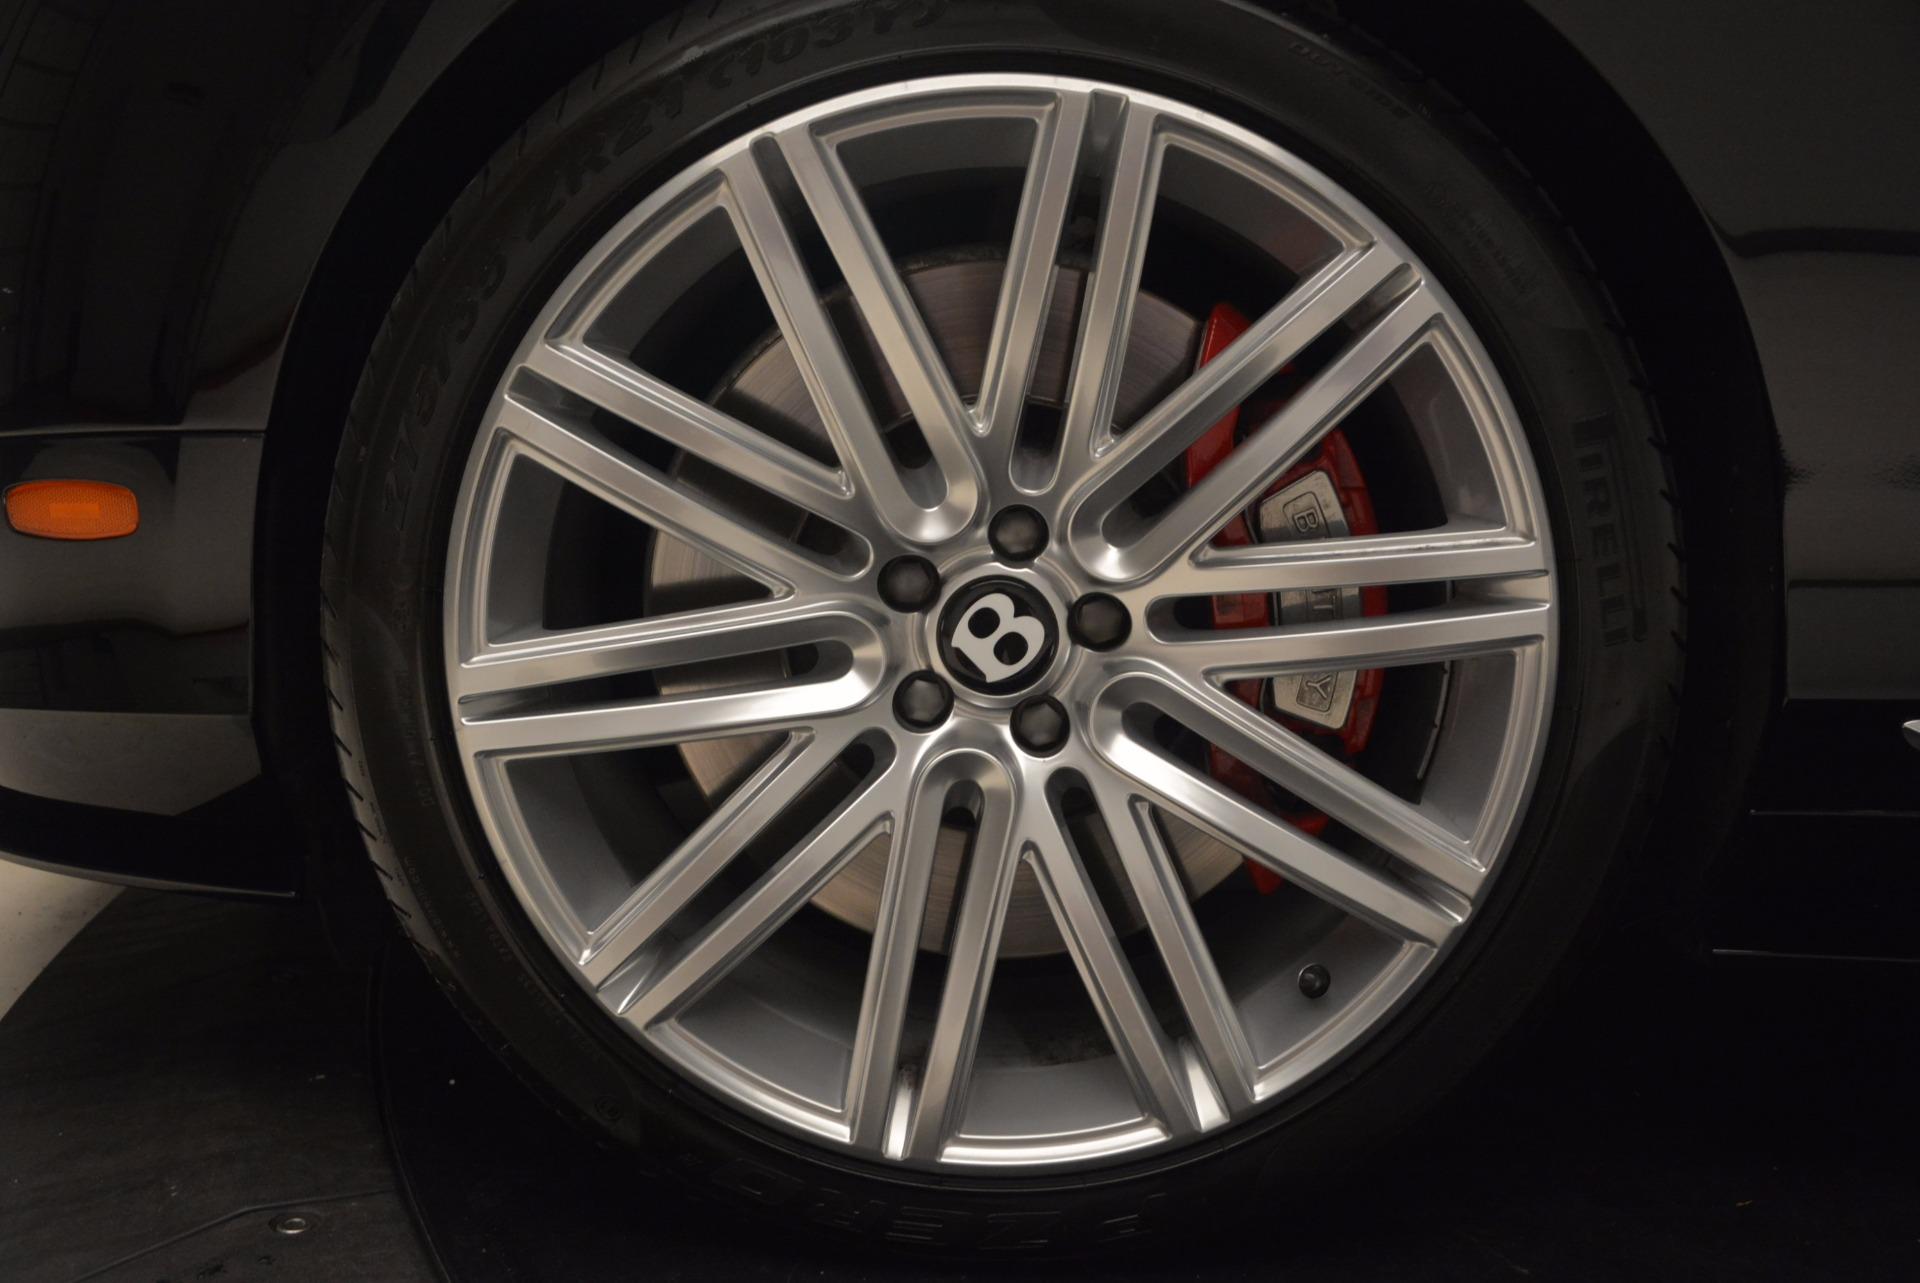 Used 2015 Bentley Continental GT Speed For Sale In Westport, CT 1646_p17